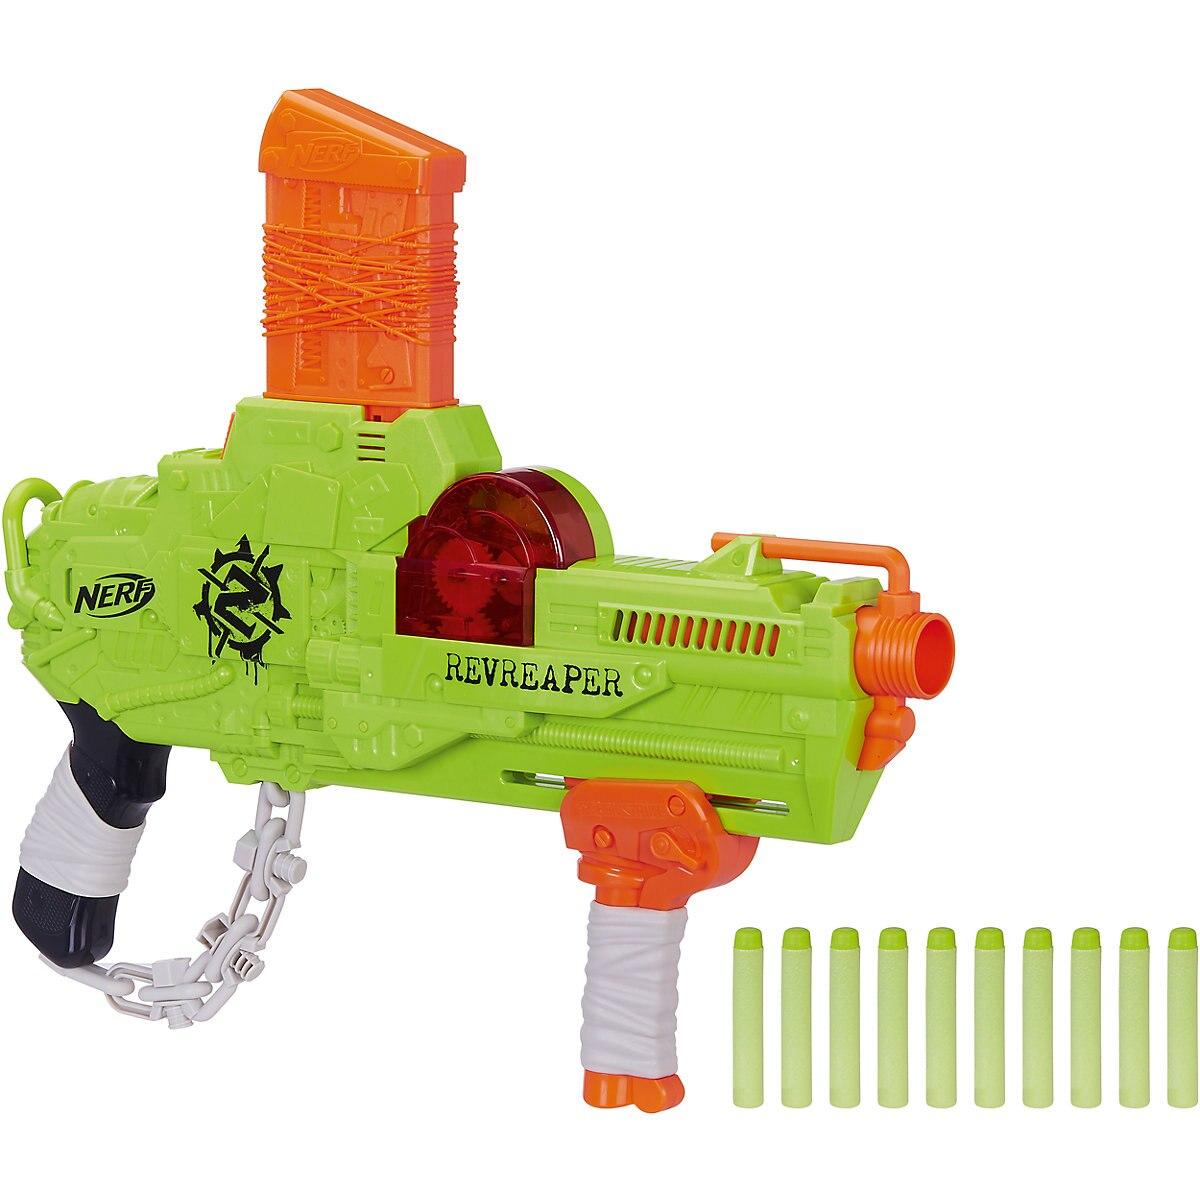 NERF jouet pistolets 8073985 pistolet arme jouets jeux pneumatique blaster garçon orbiz revolver plein air plaisir sport MTpromo